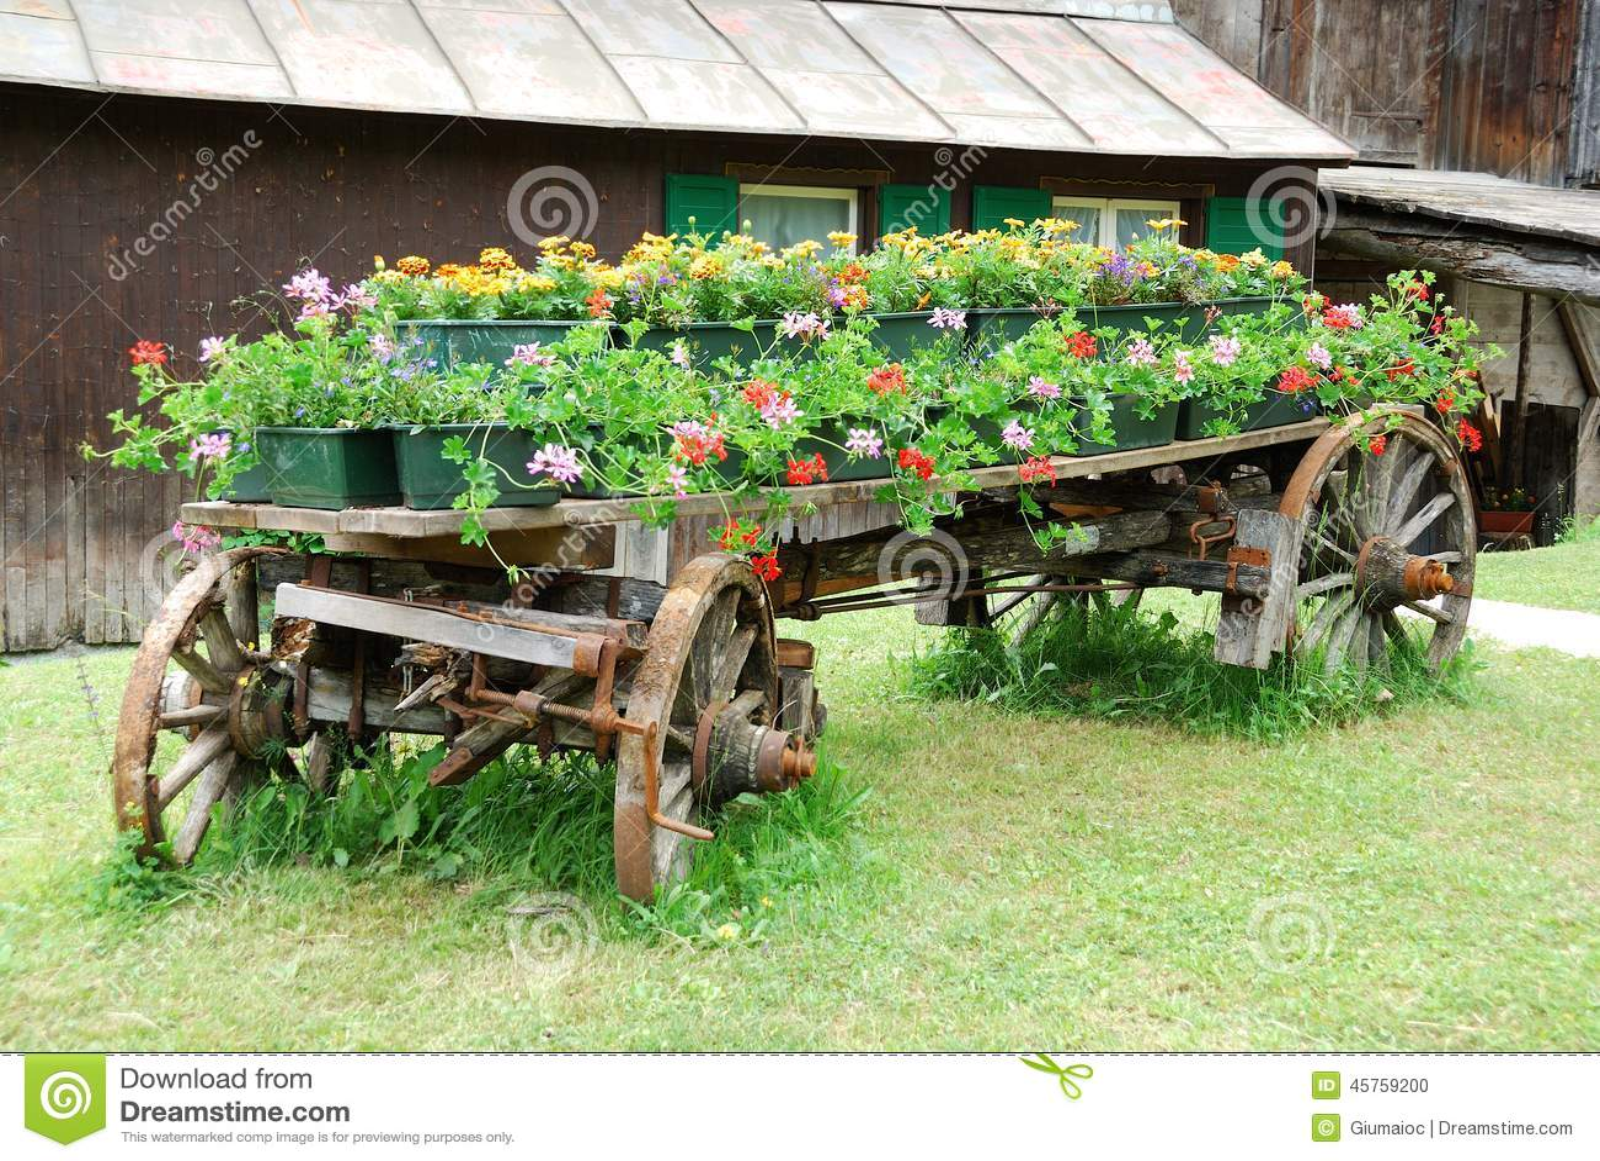 Brouette avec des fleurs photo stock image du jardinage for Brouette de jardin